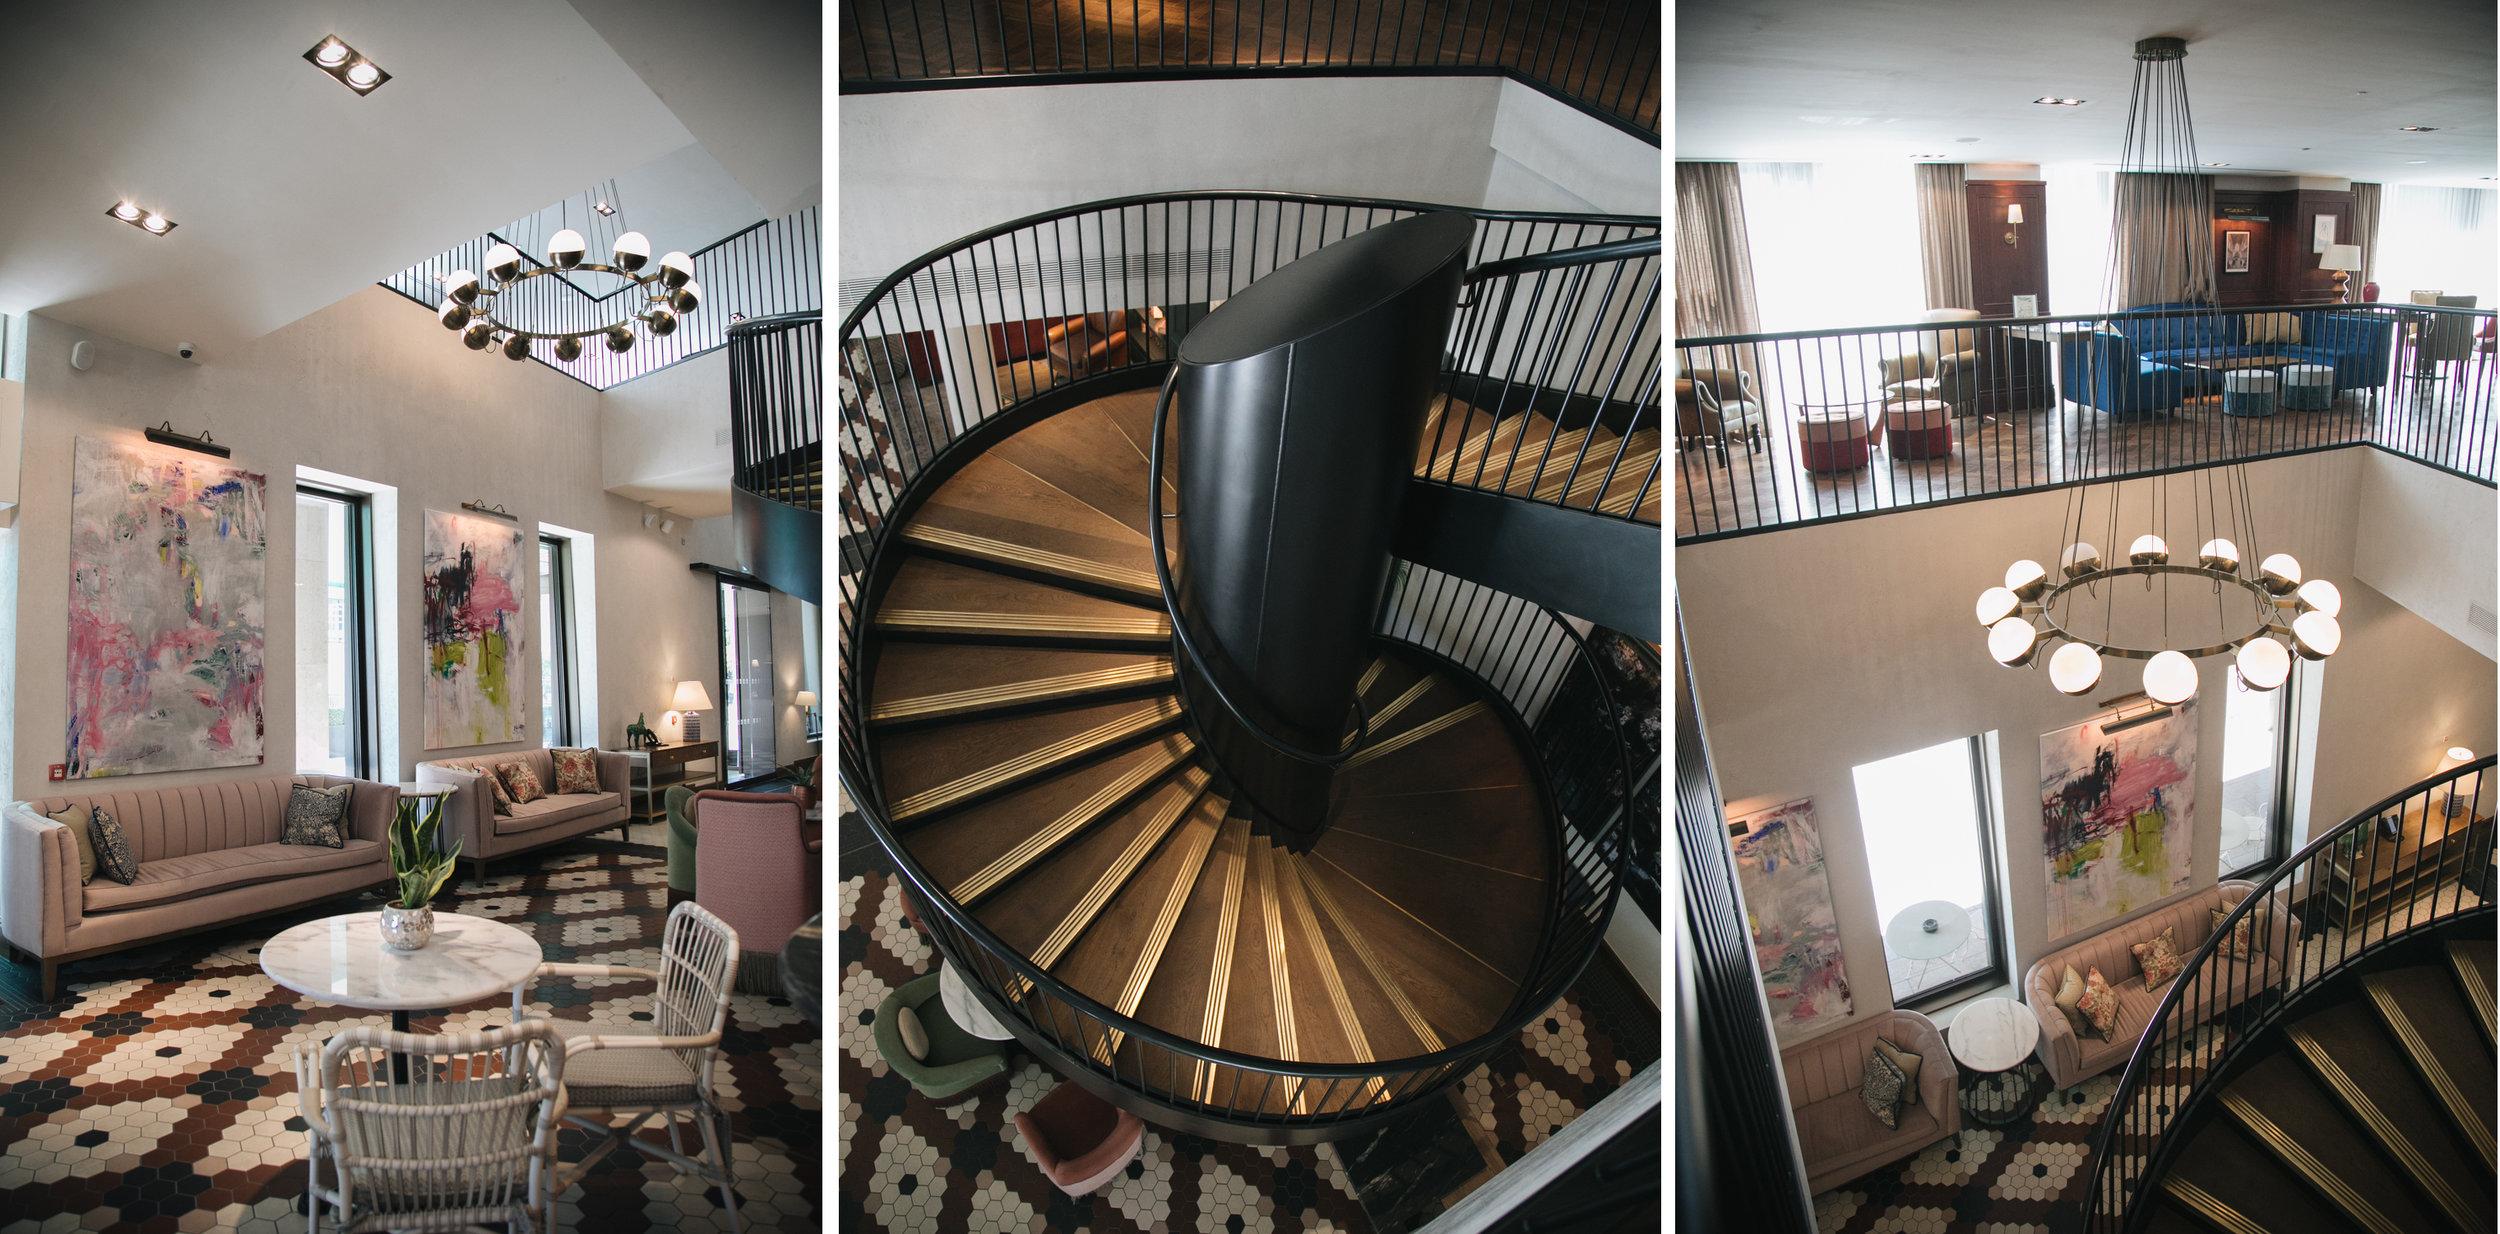 TheTamburlaine-hotel-cambridge-bonne-adresse.jpg